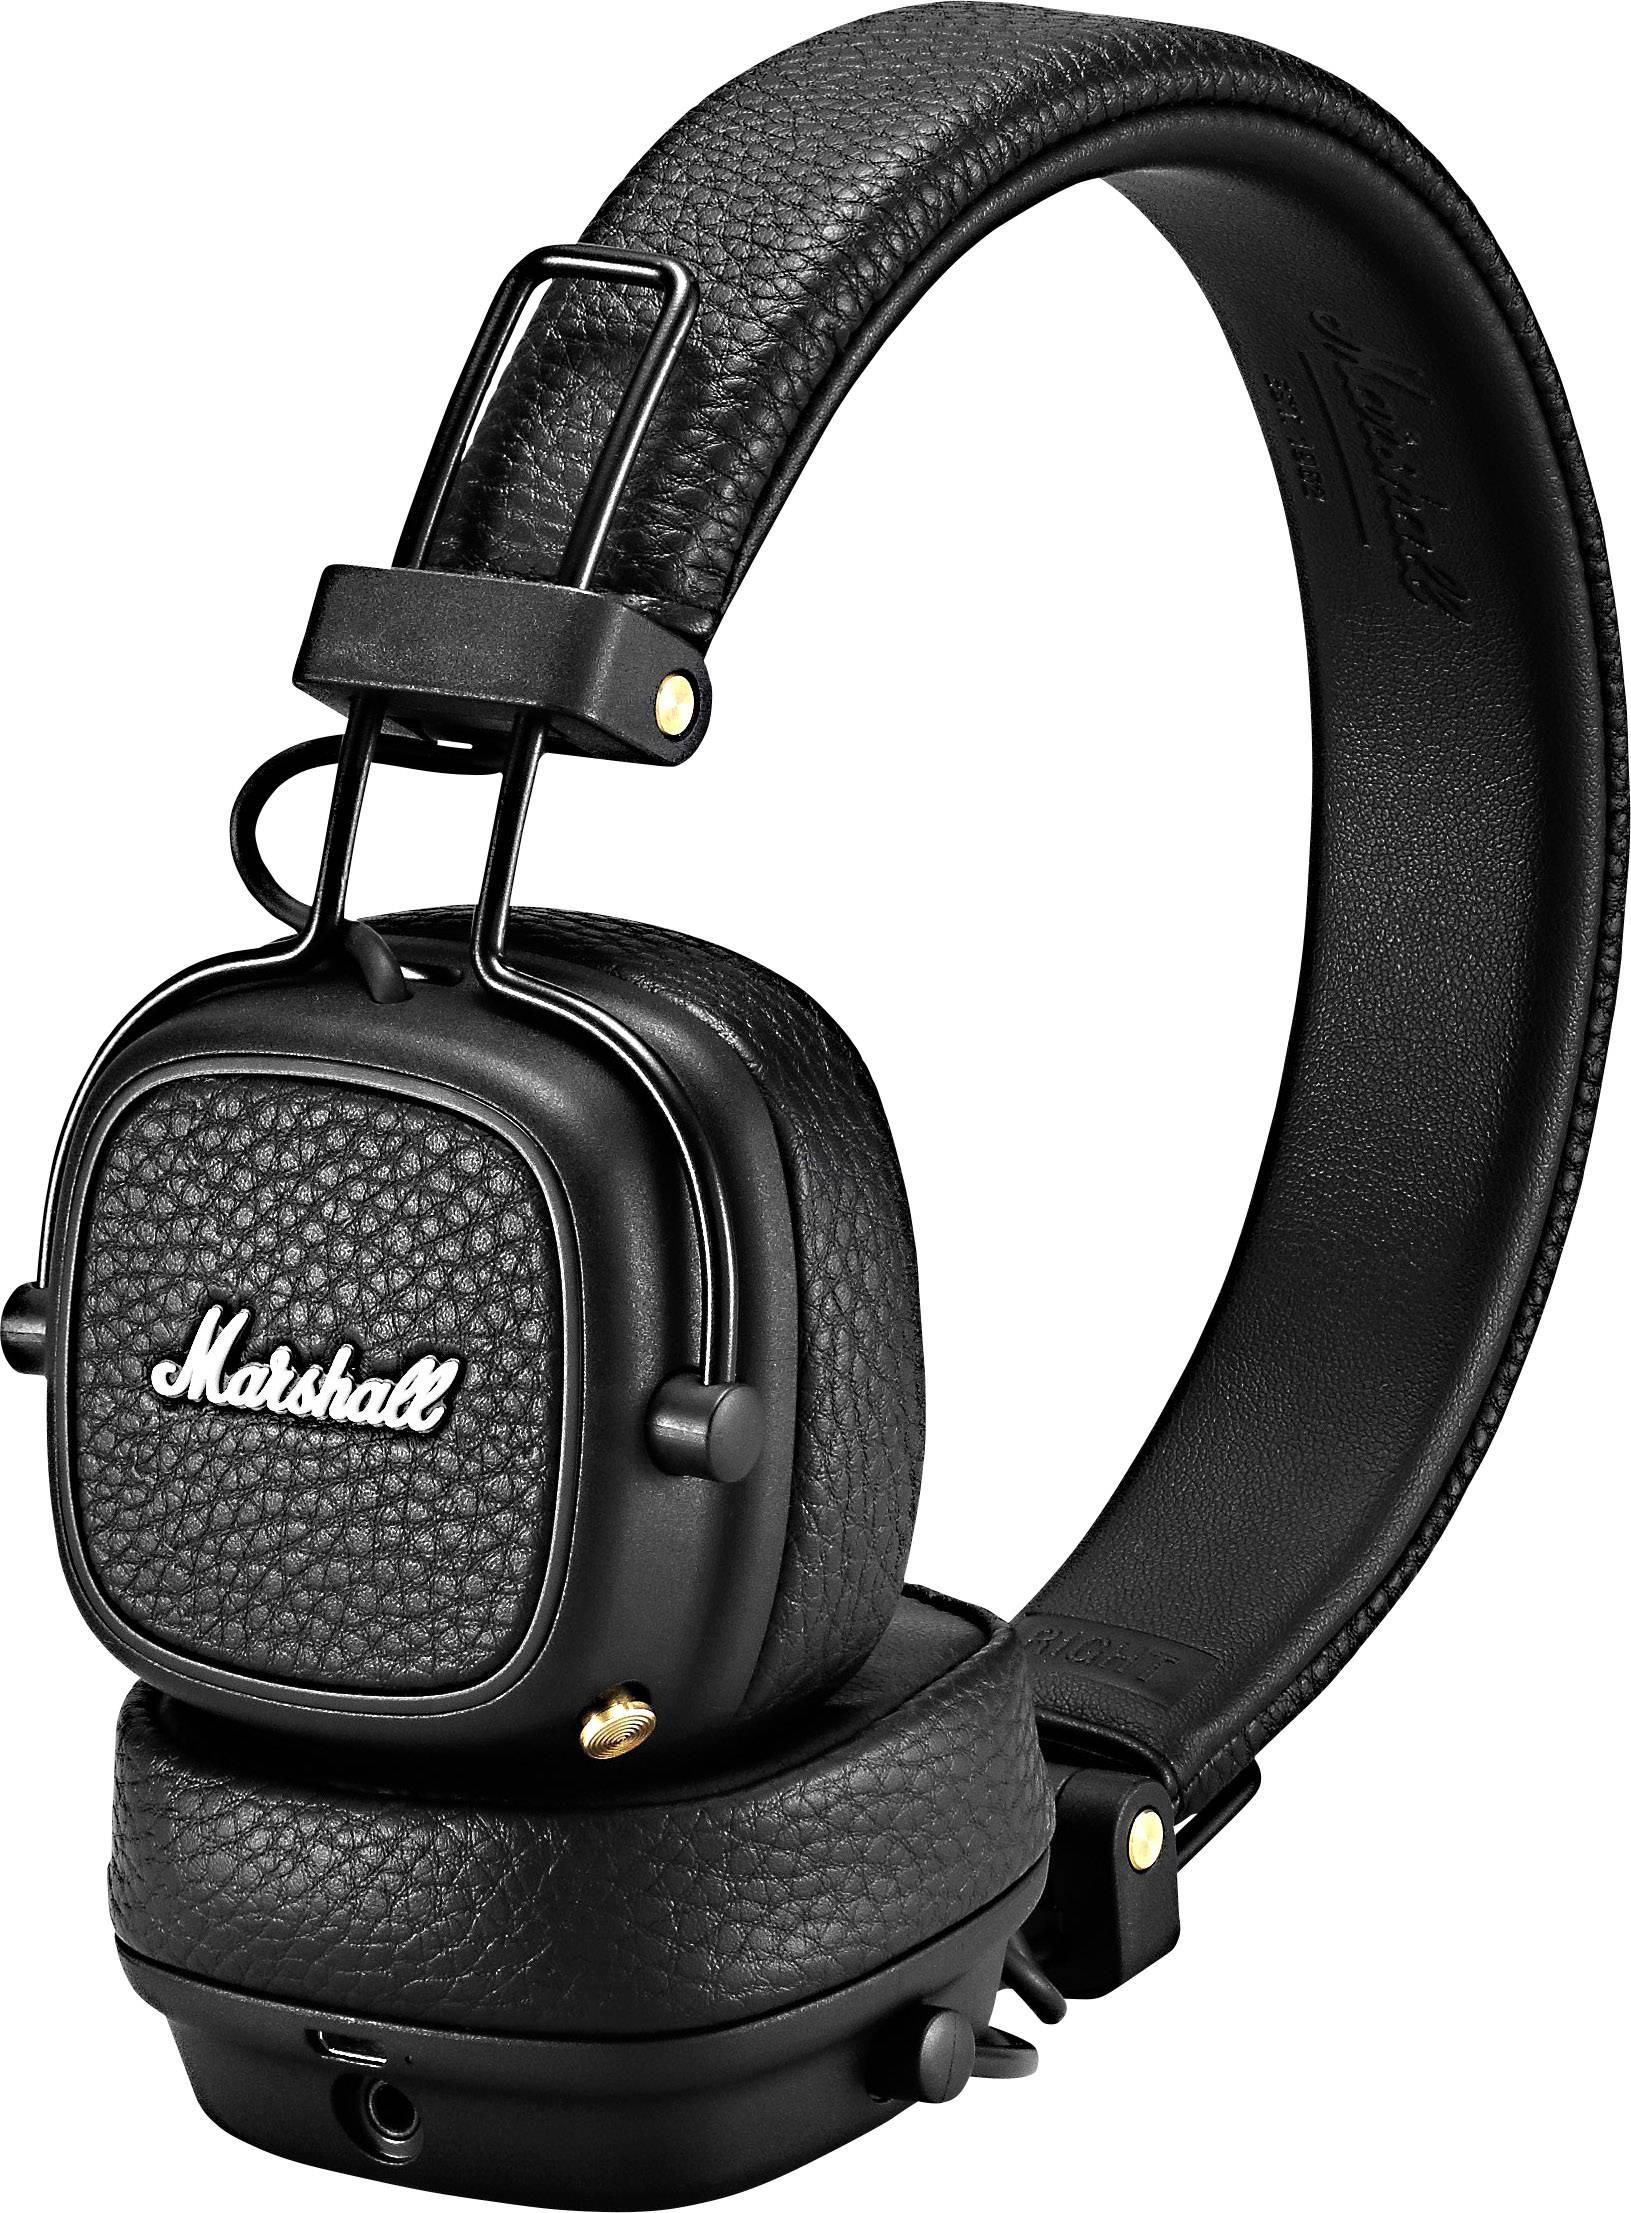 Marshall Major III Bluetooth Headset Faltbare Kopfhörer Schwarz Stereo